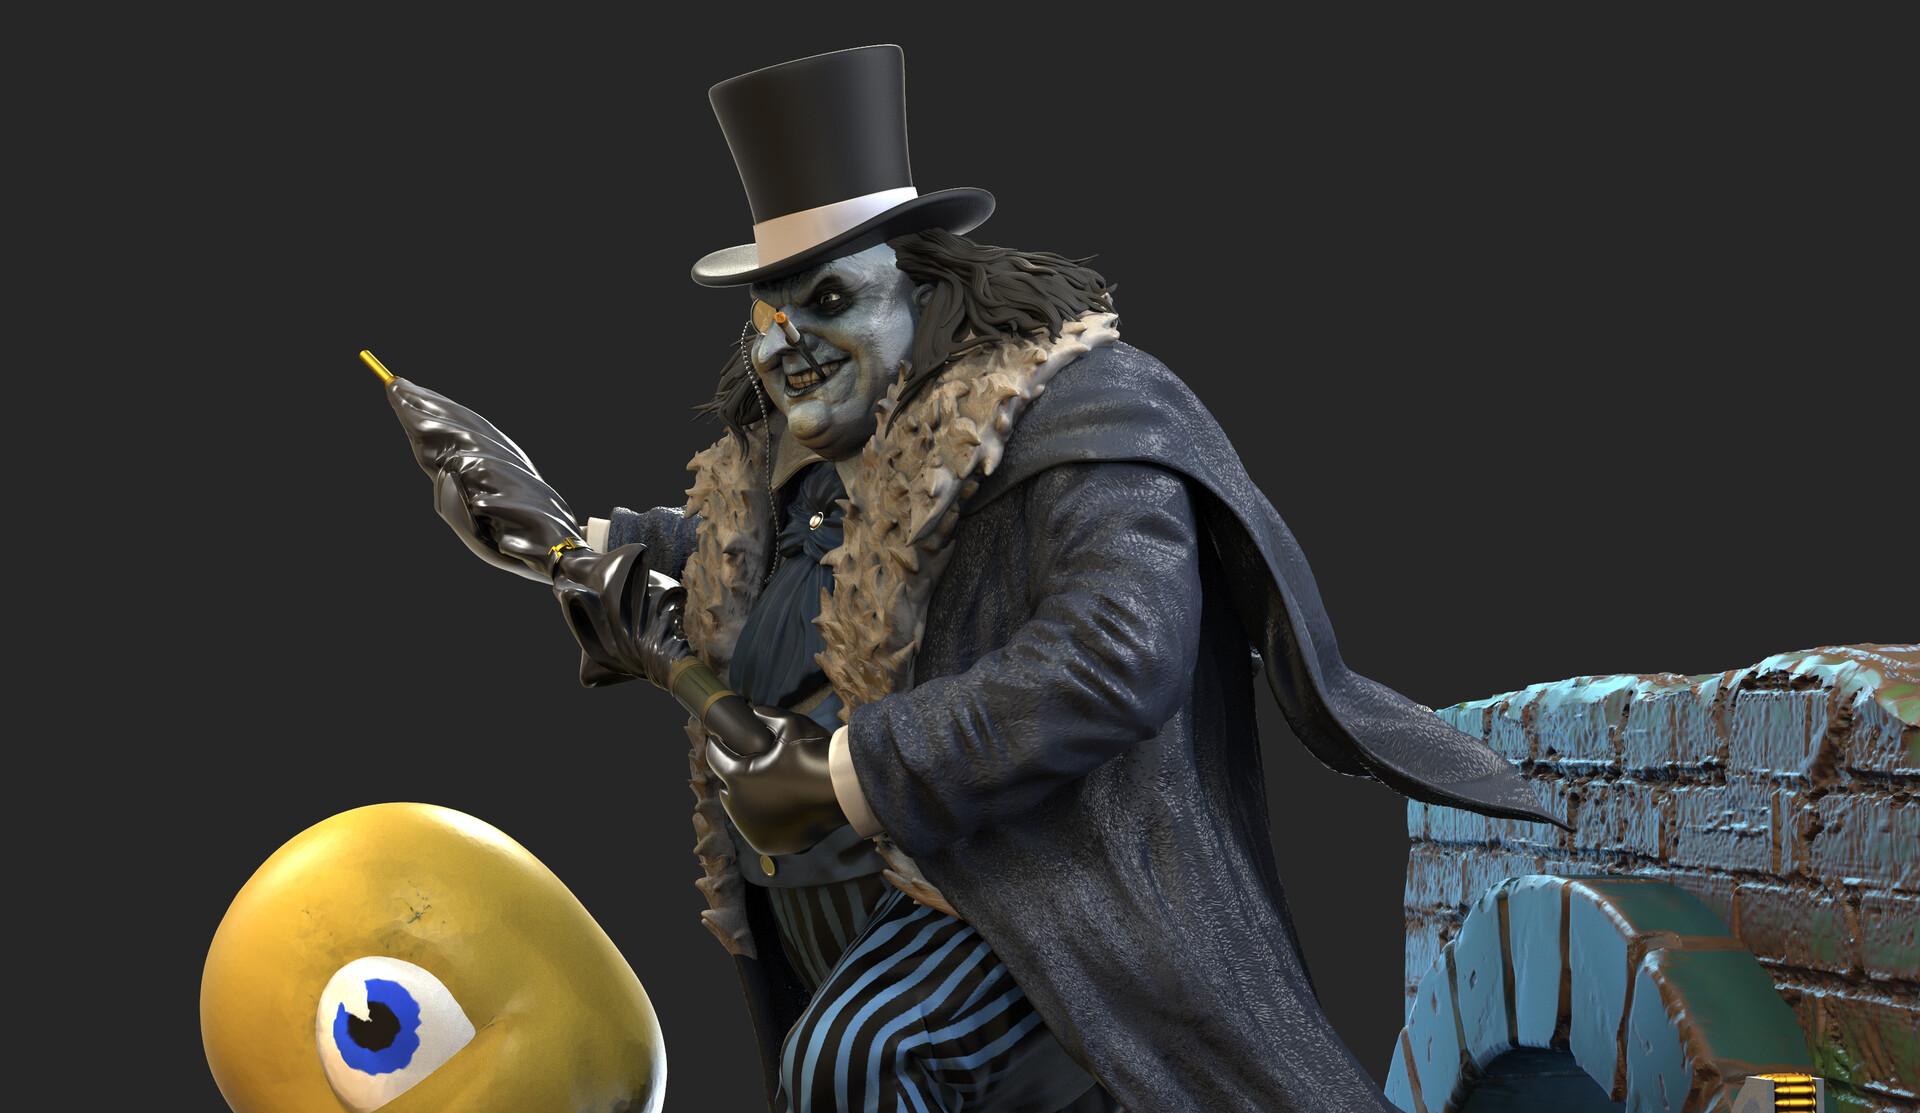 Andre ferwerda penguin 07